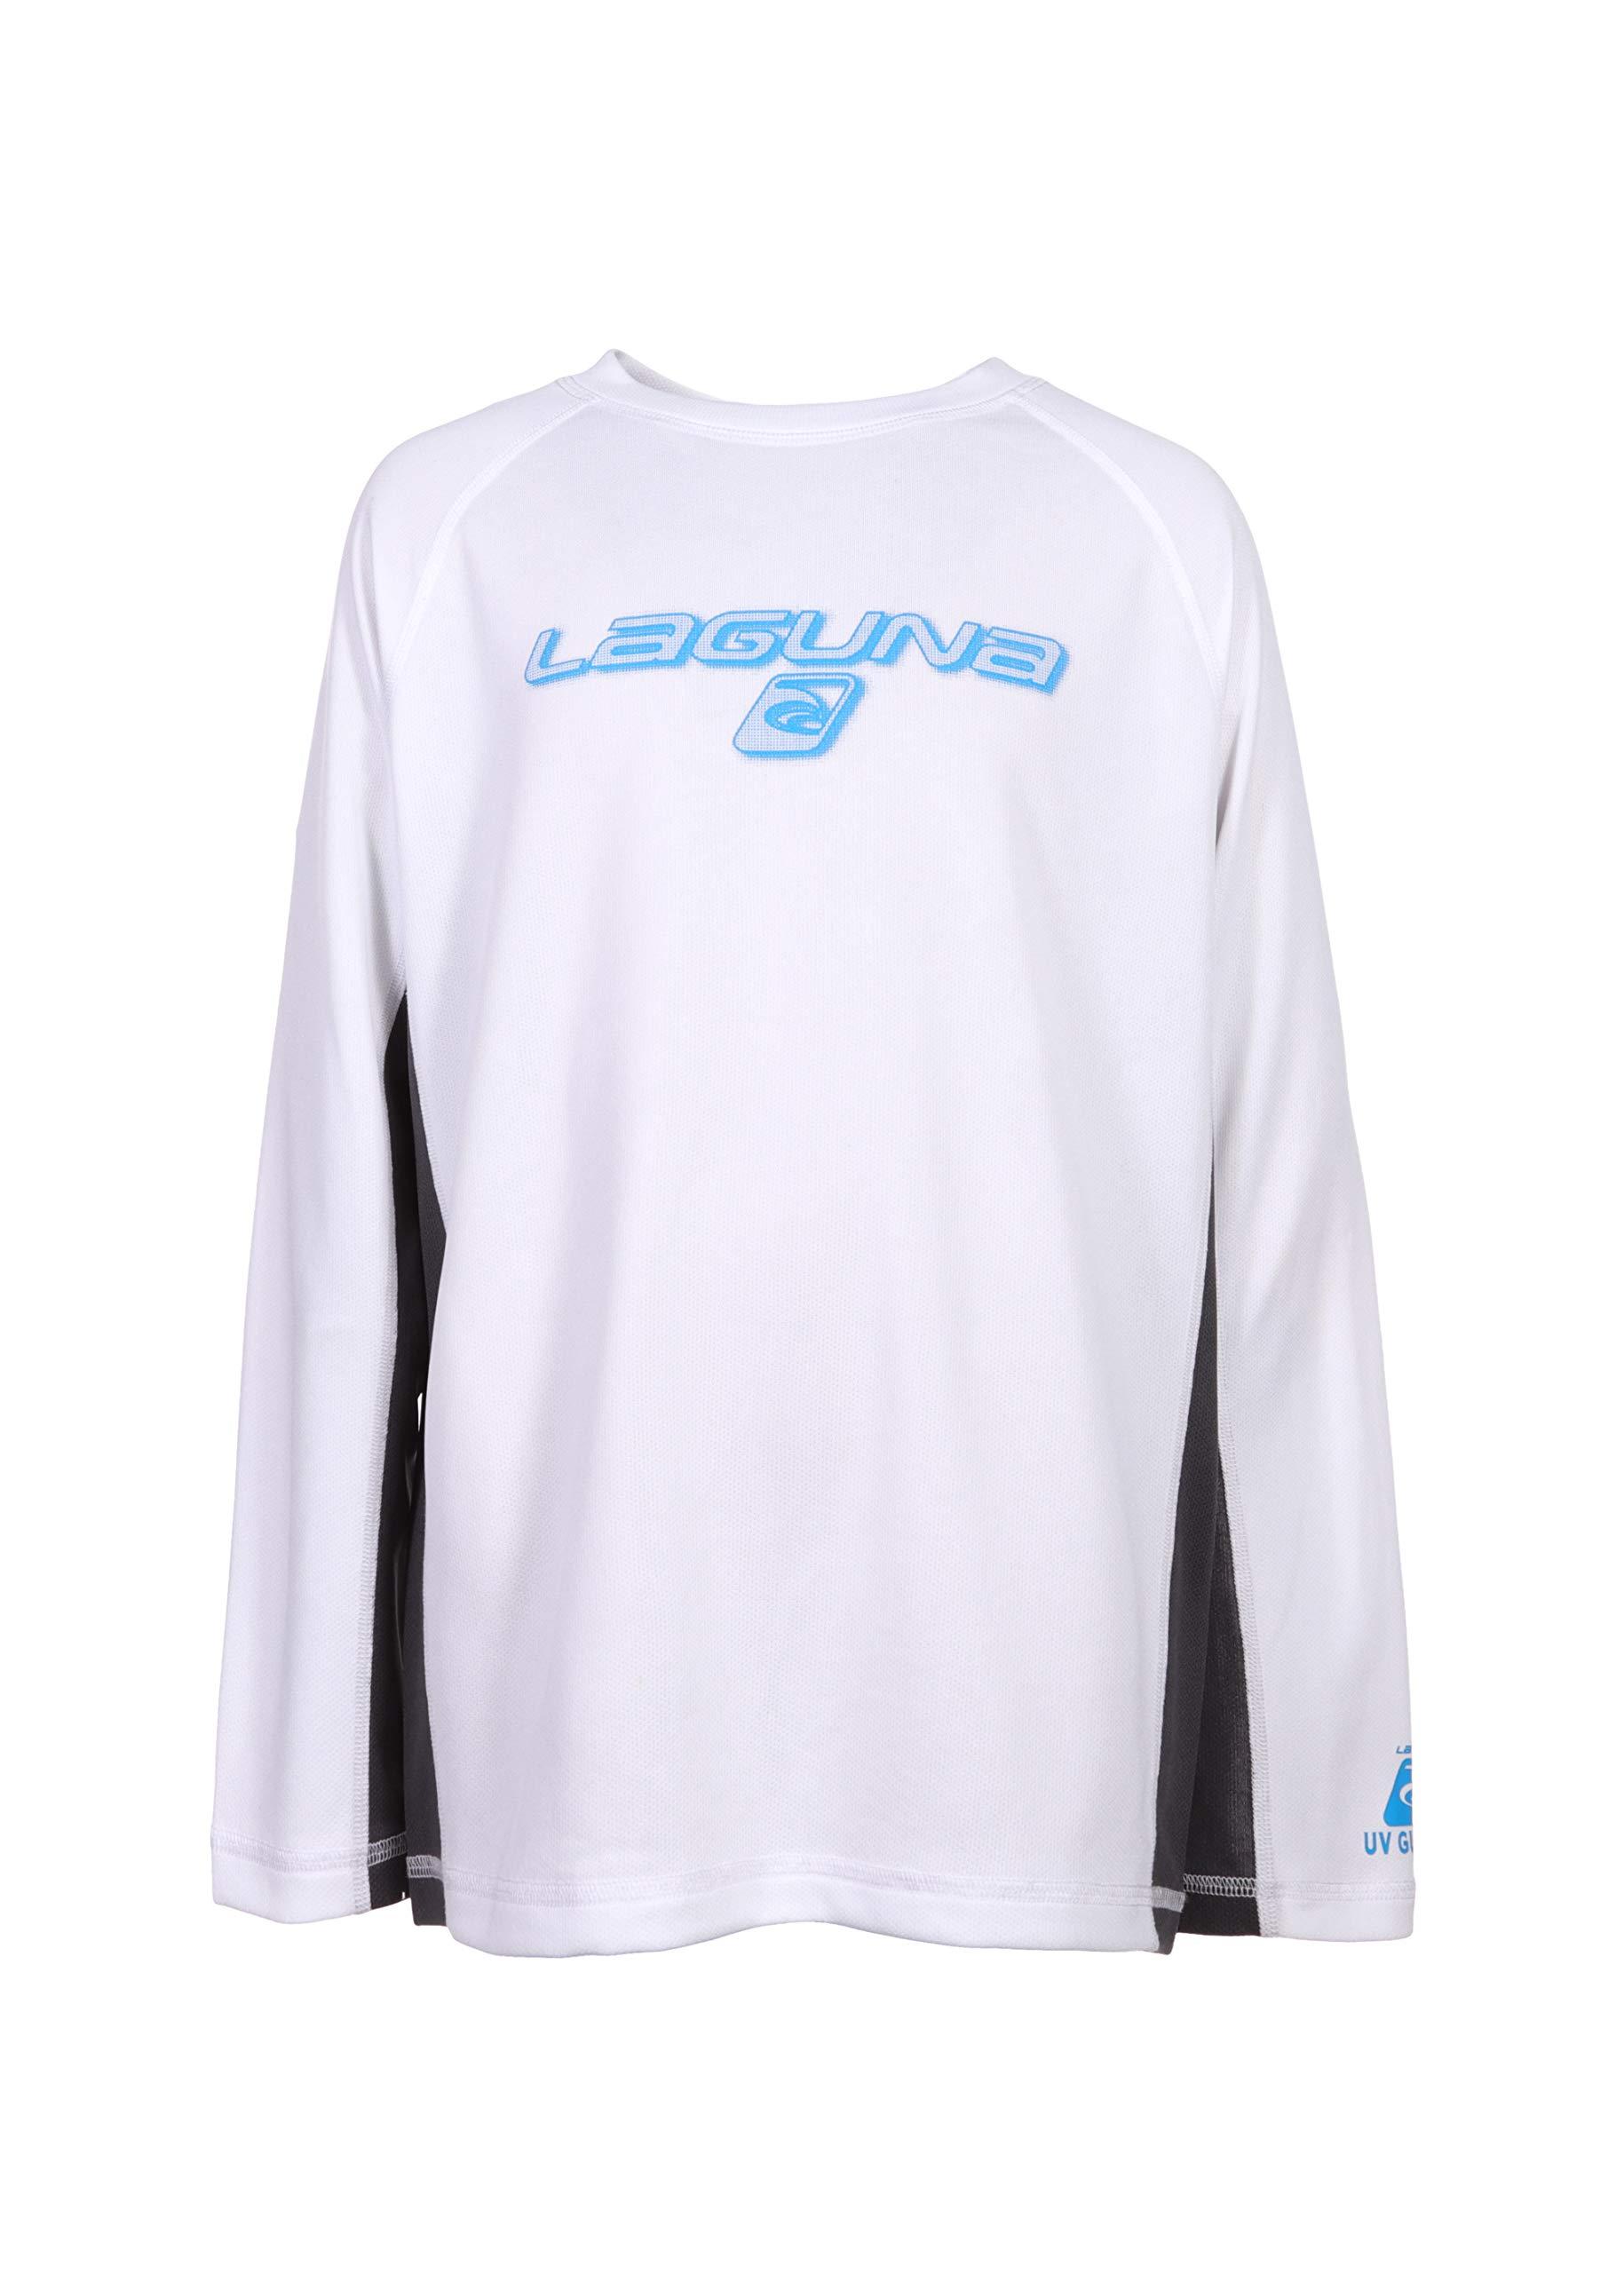 LAGUNA Boys Crewneck Long Sleeve Loose Fit Rashguard Swim Sun Tee Shirt, UPF 50+, White/Grey/Blue, 14/16